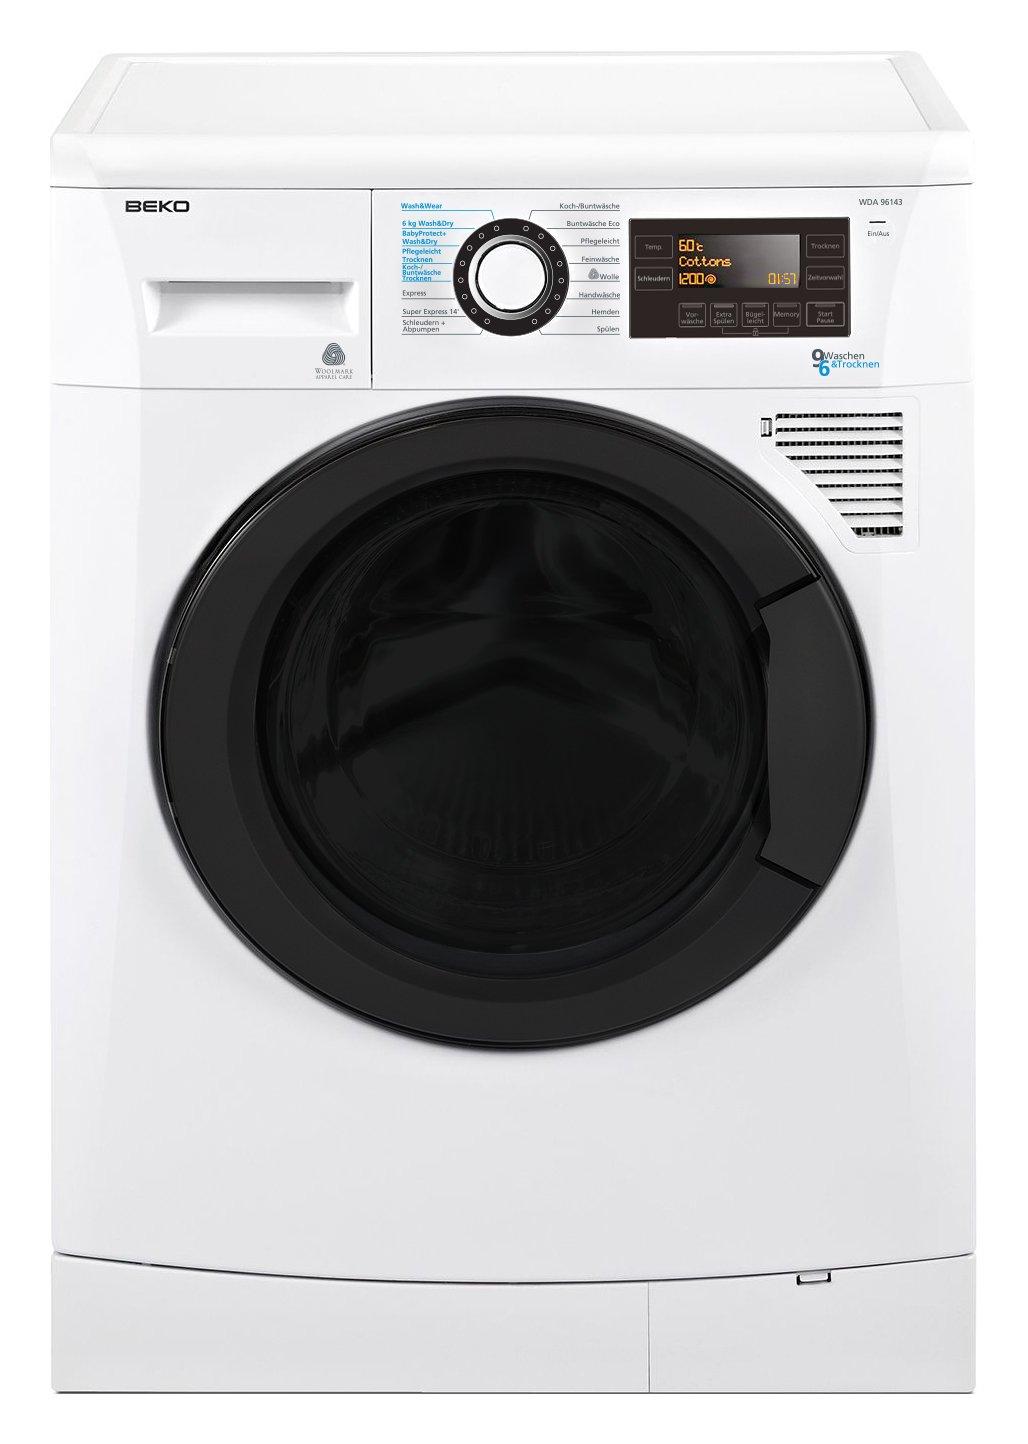 Beko WDA 96143 lavadora - Lavadora-secadora (Frente, Color blanco ...